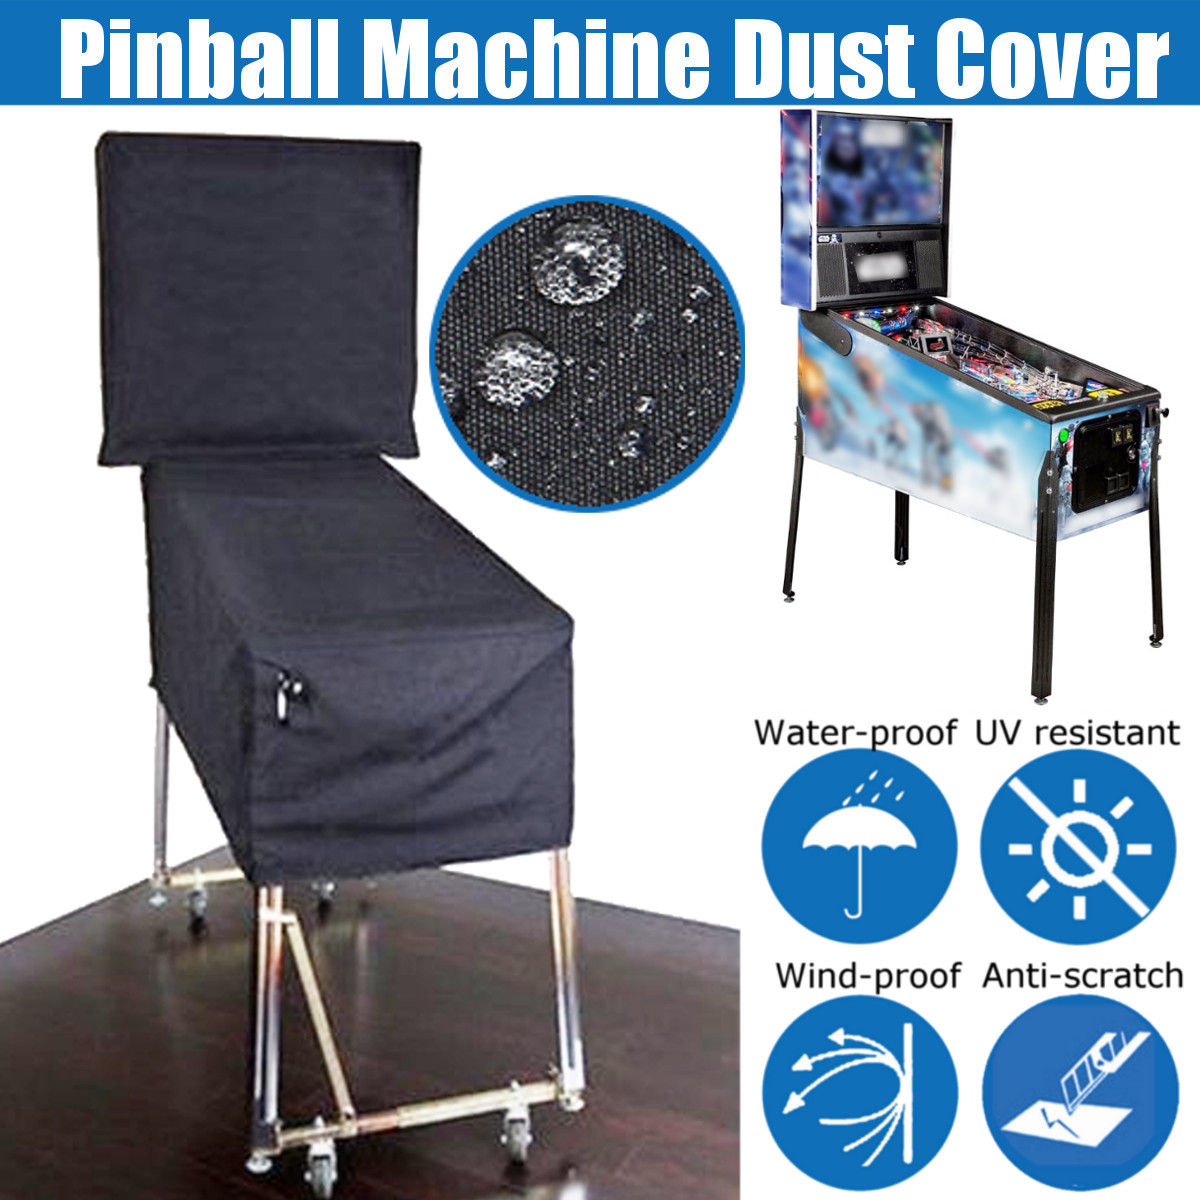 Pinball Machine Cover Dustproof Waterproof Anti UV Outdoor For Wedgehead Gottlieb 80Bally Widebody 90/70/80s Pinball Parts